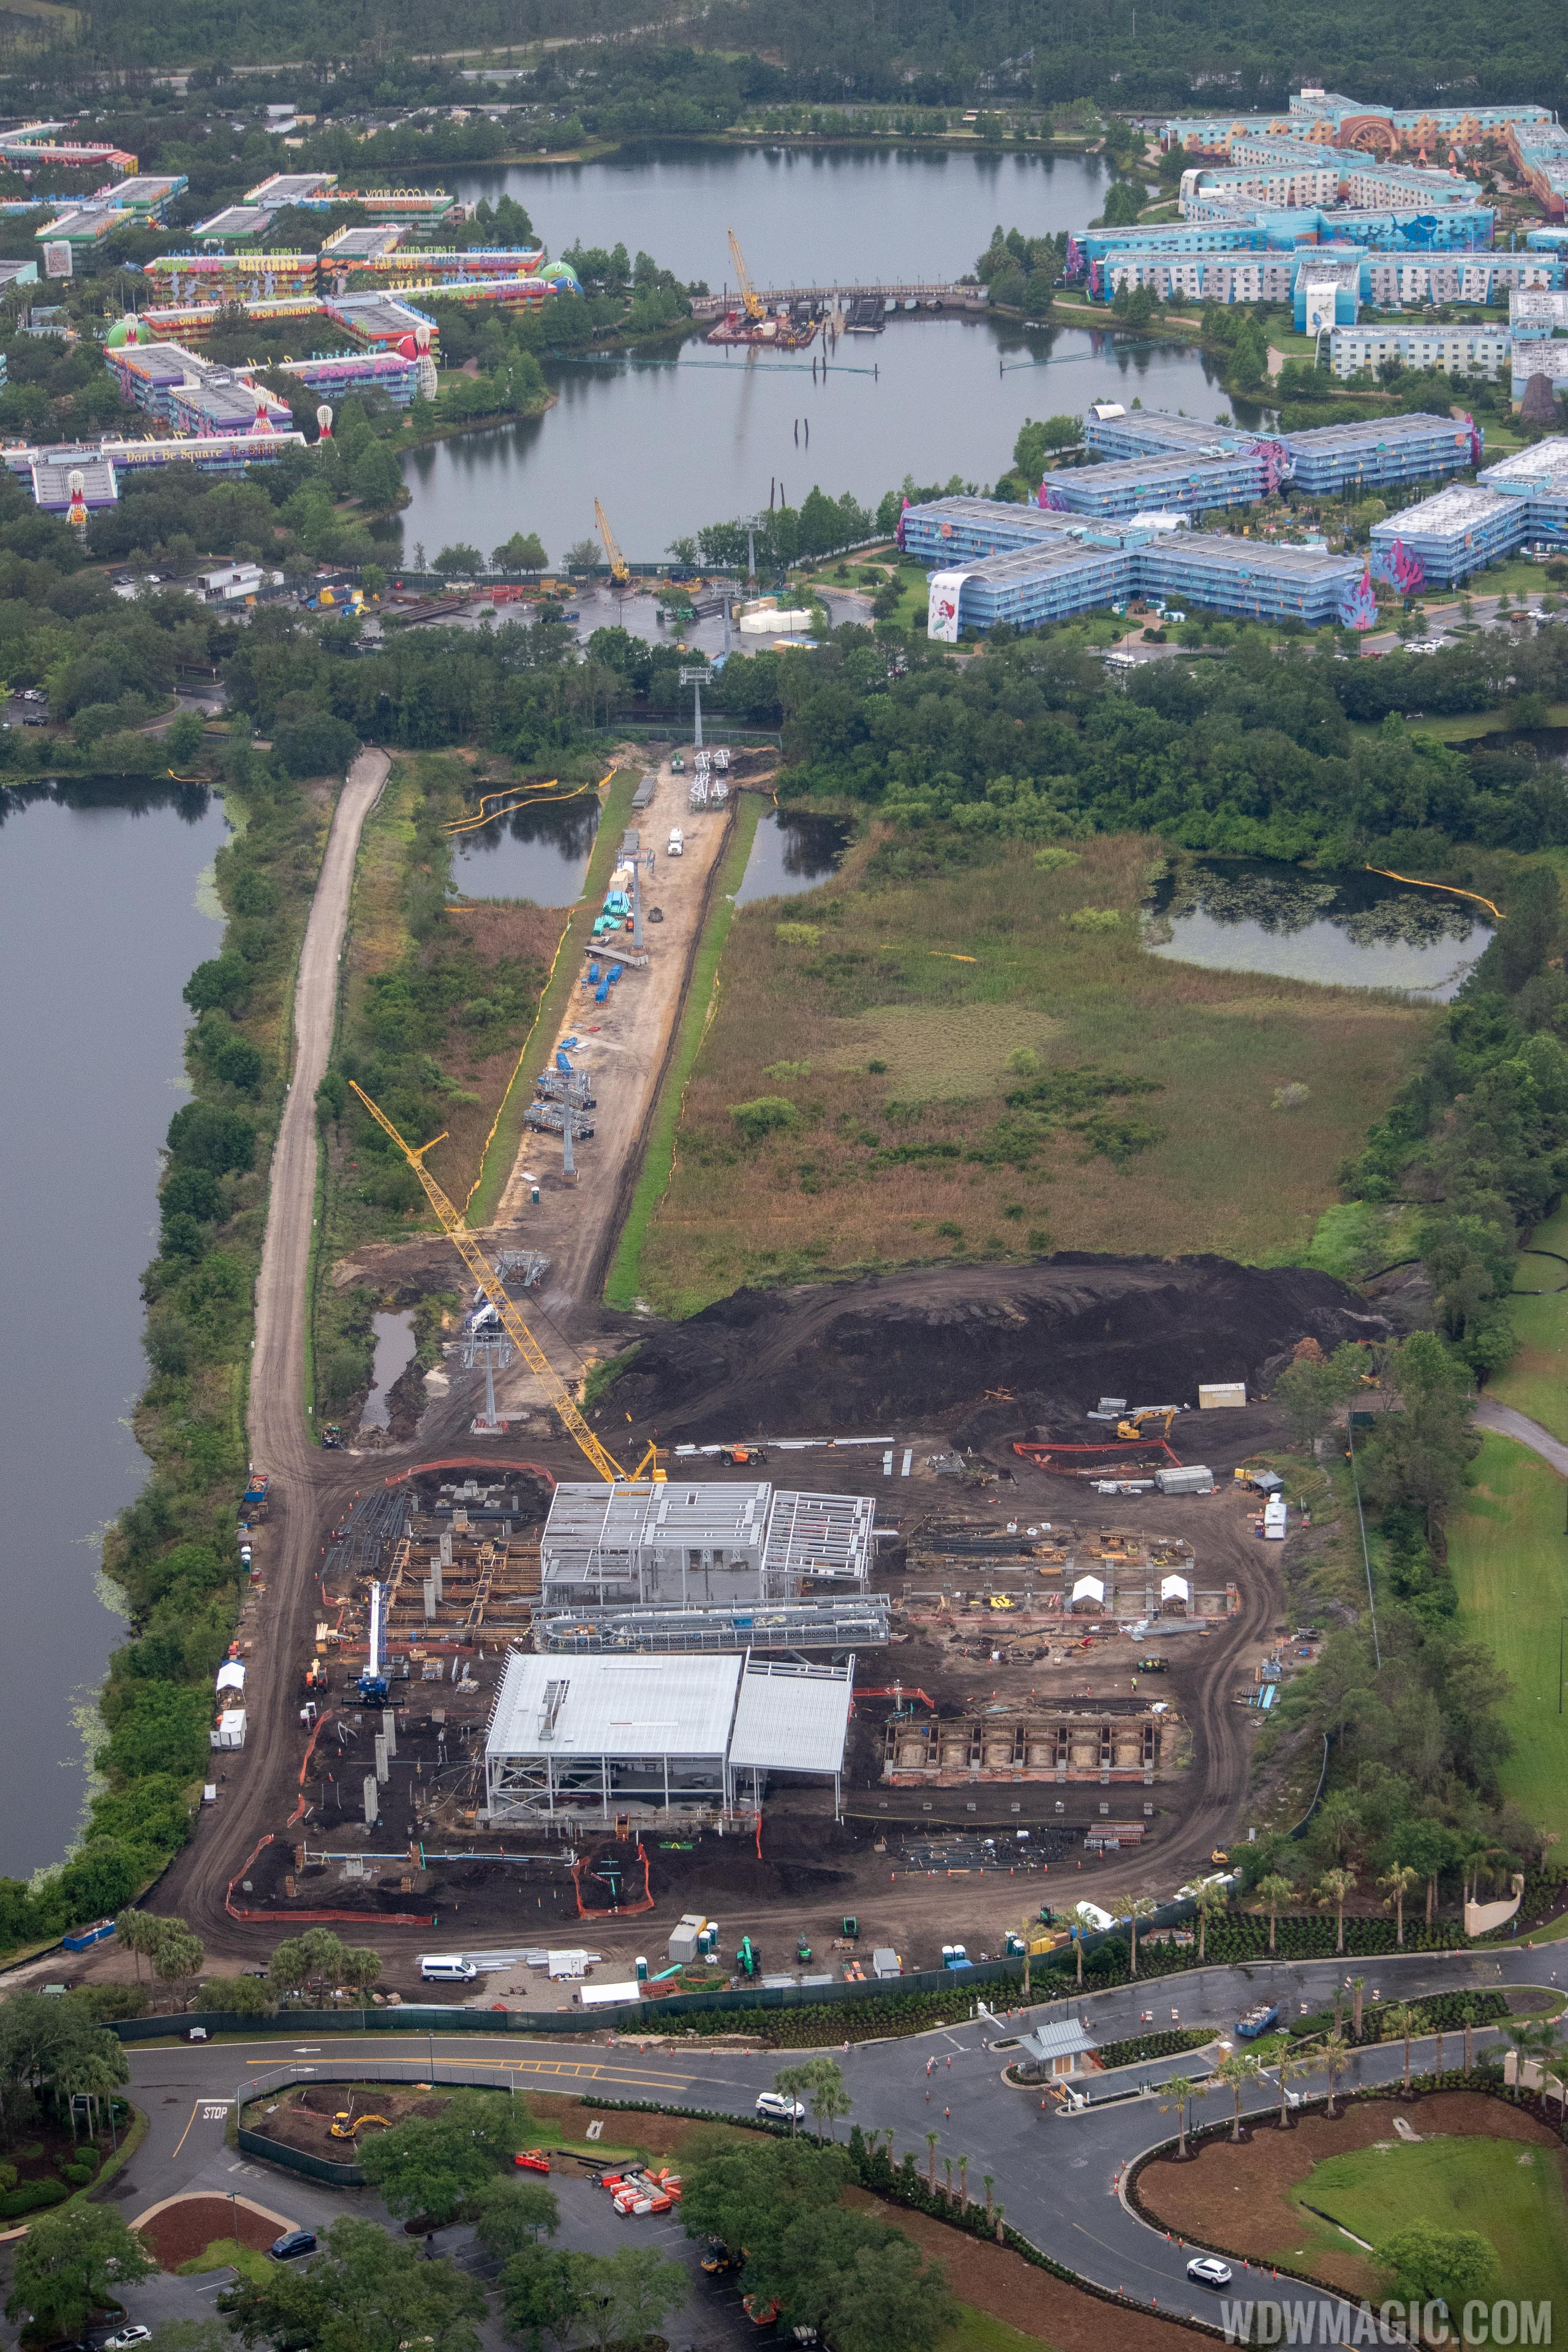 PHOTOS - Disney Skyliner views from the air